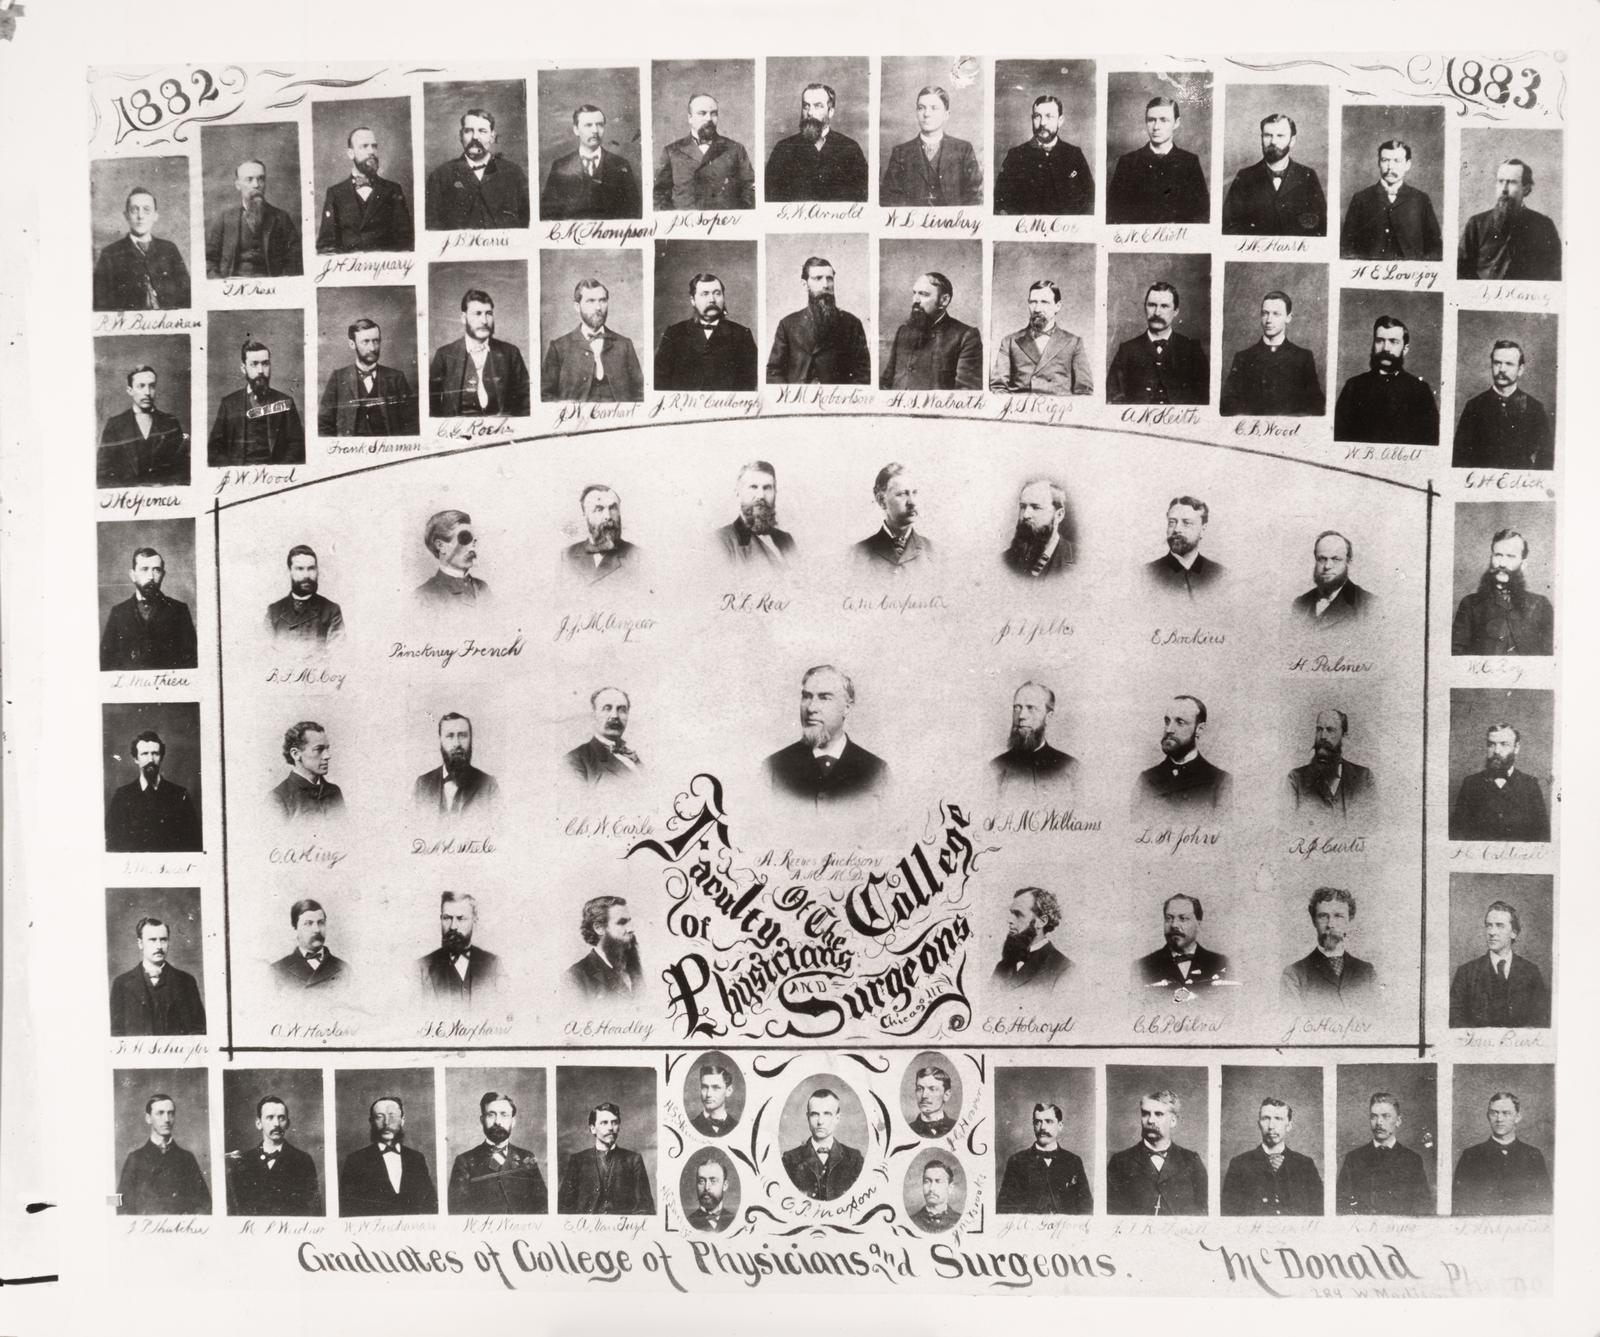 1882/1883 graduating class, University of Illinois College of Medicine